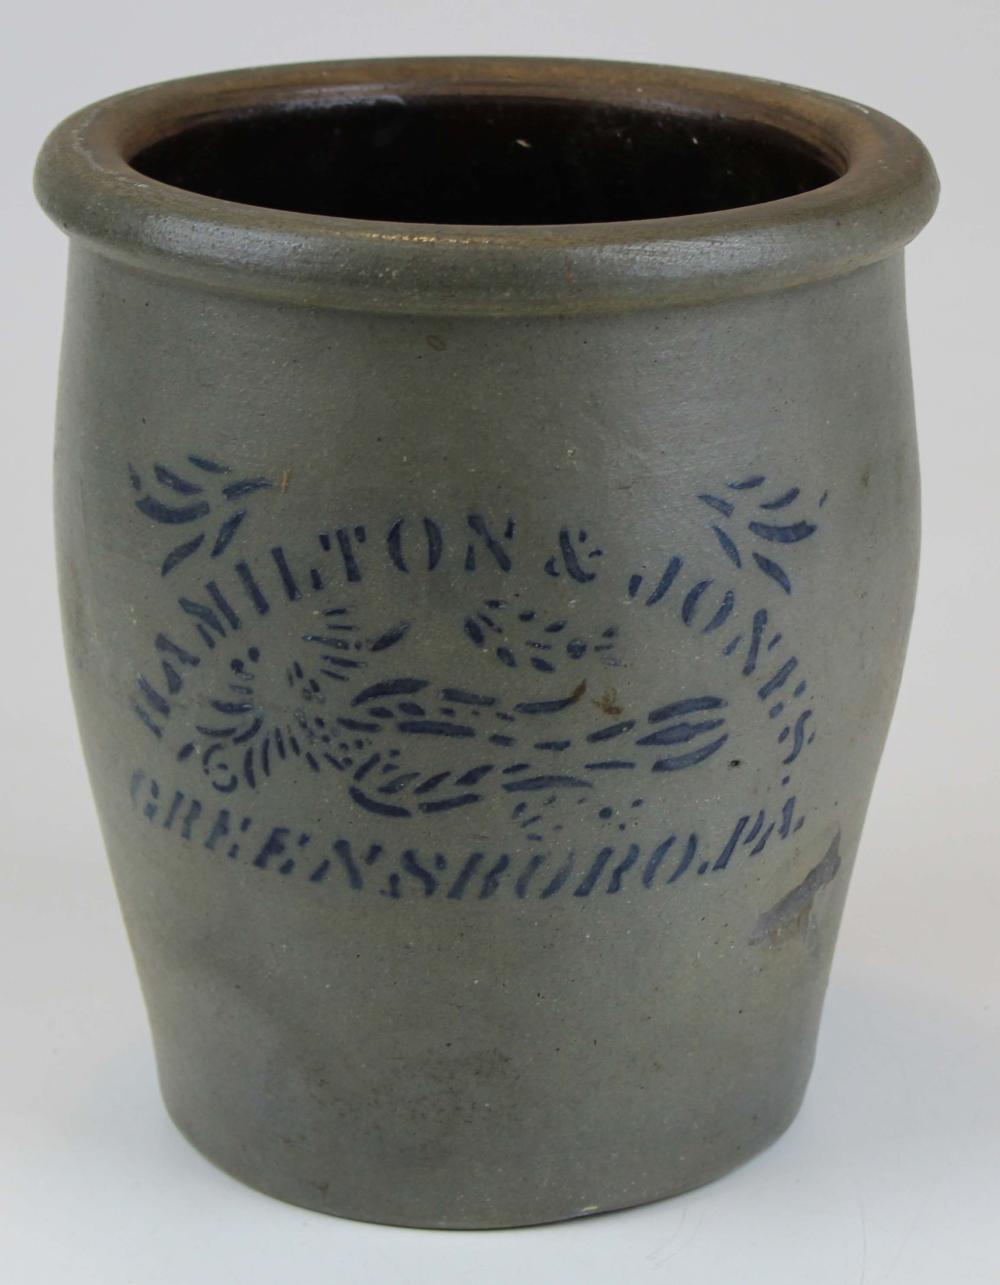 Hamilton & Jones, Greensboro, PA Stoneware Crock